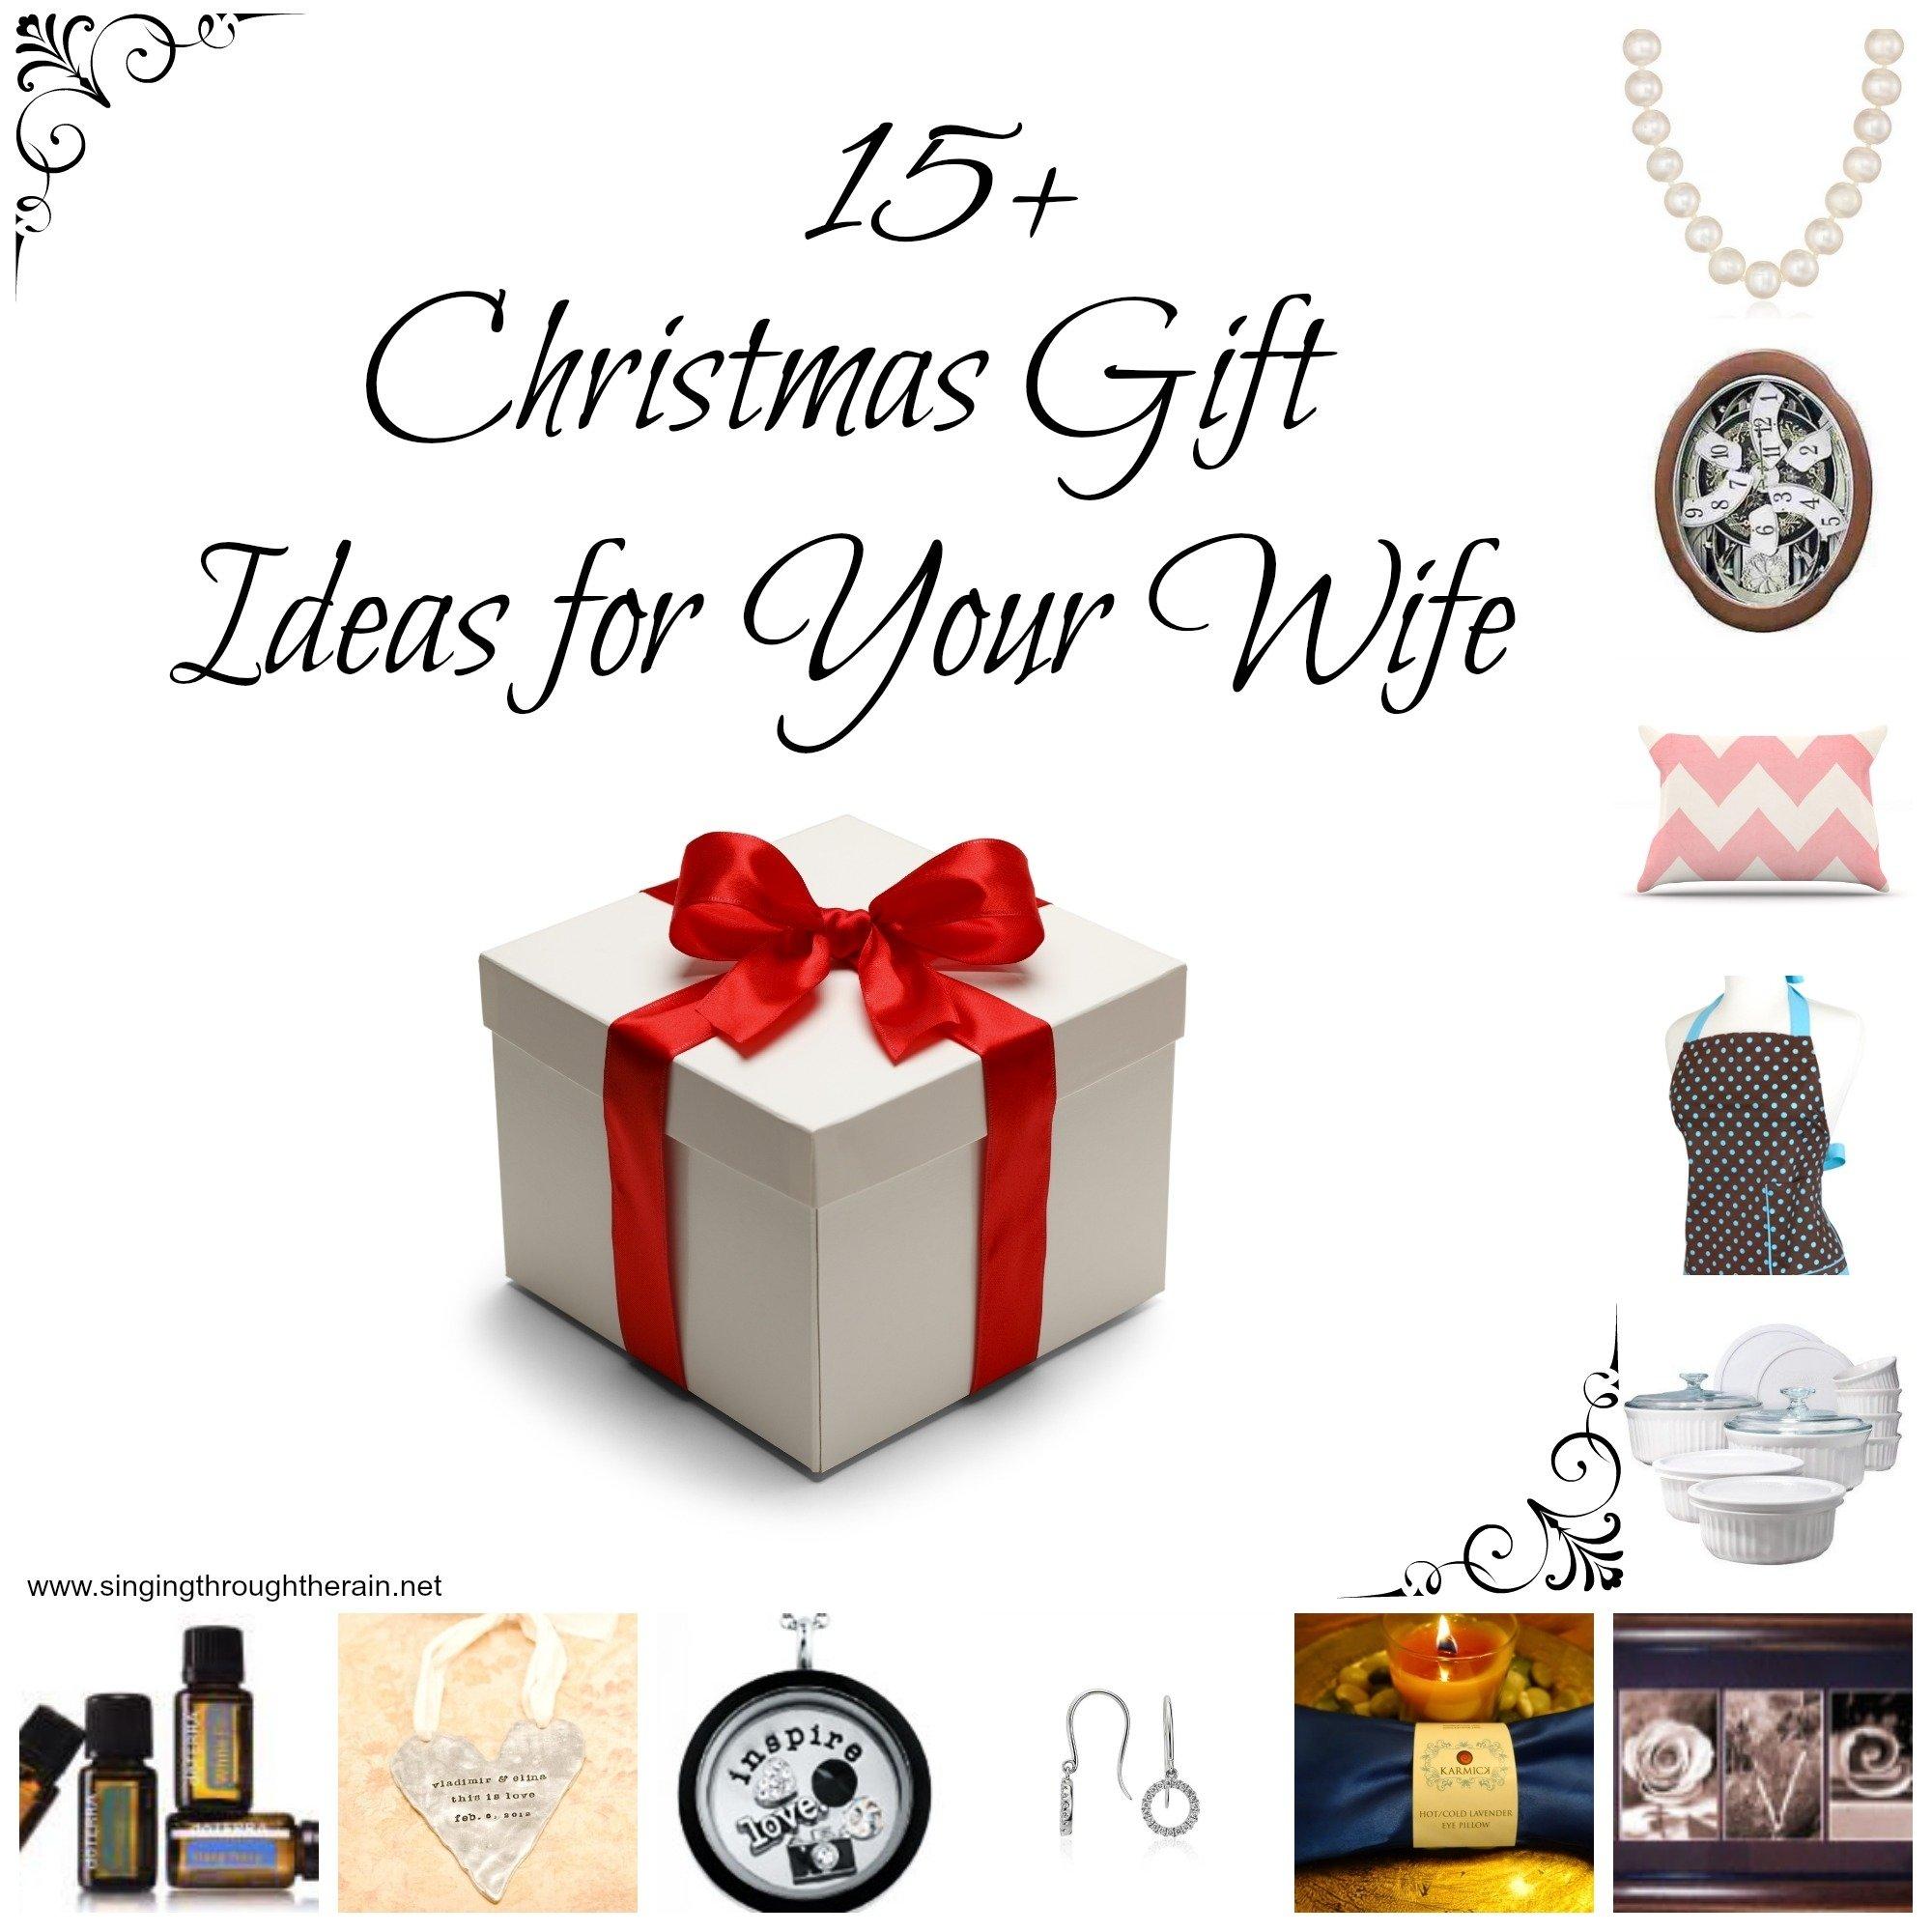 Imágenes de Ideas For Wifes Christmas Presents